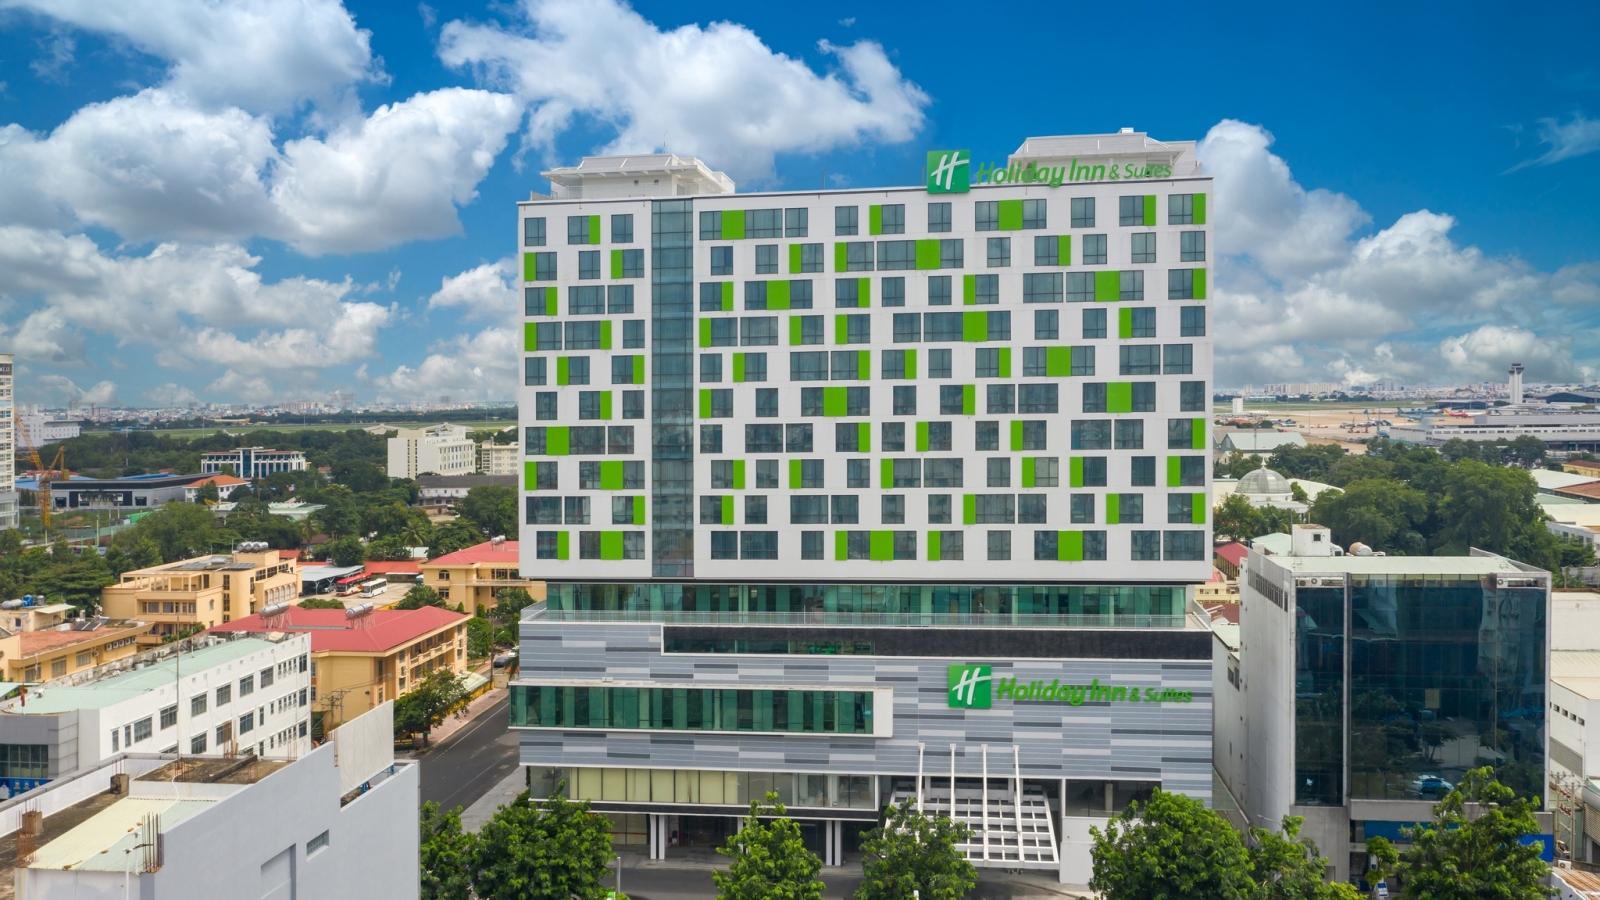 Three Holiday Inn Hotels to open Vietnamese location